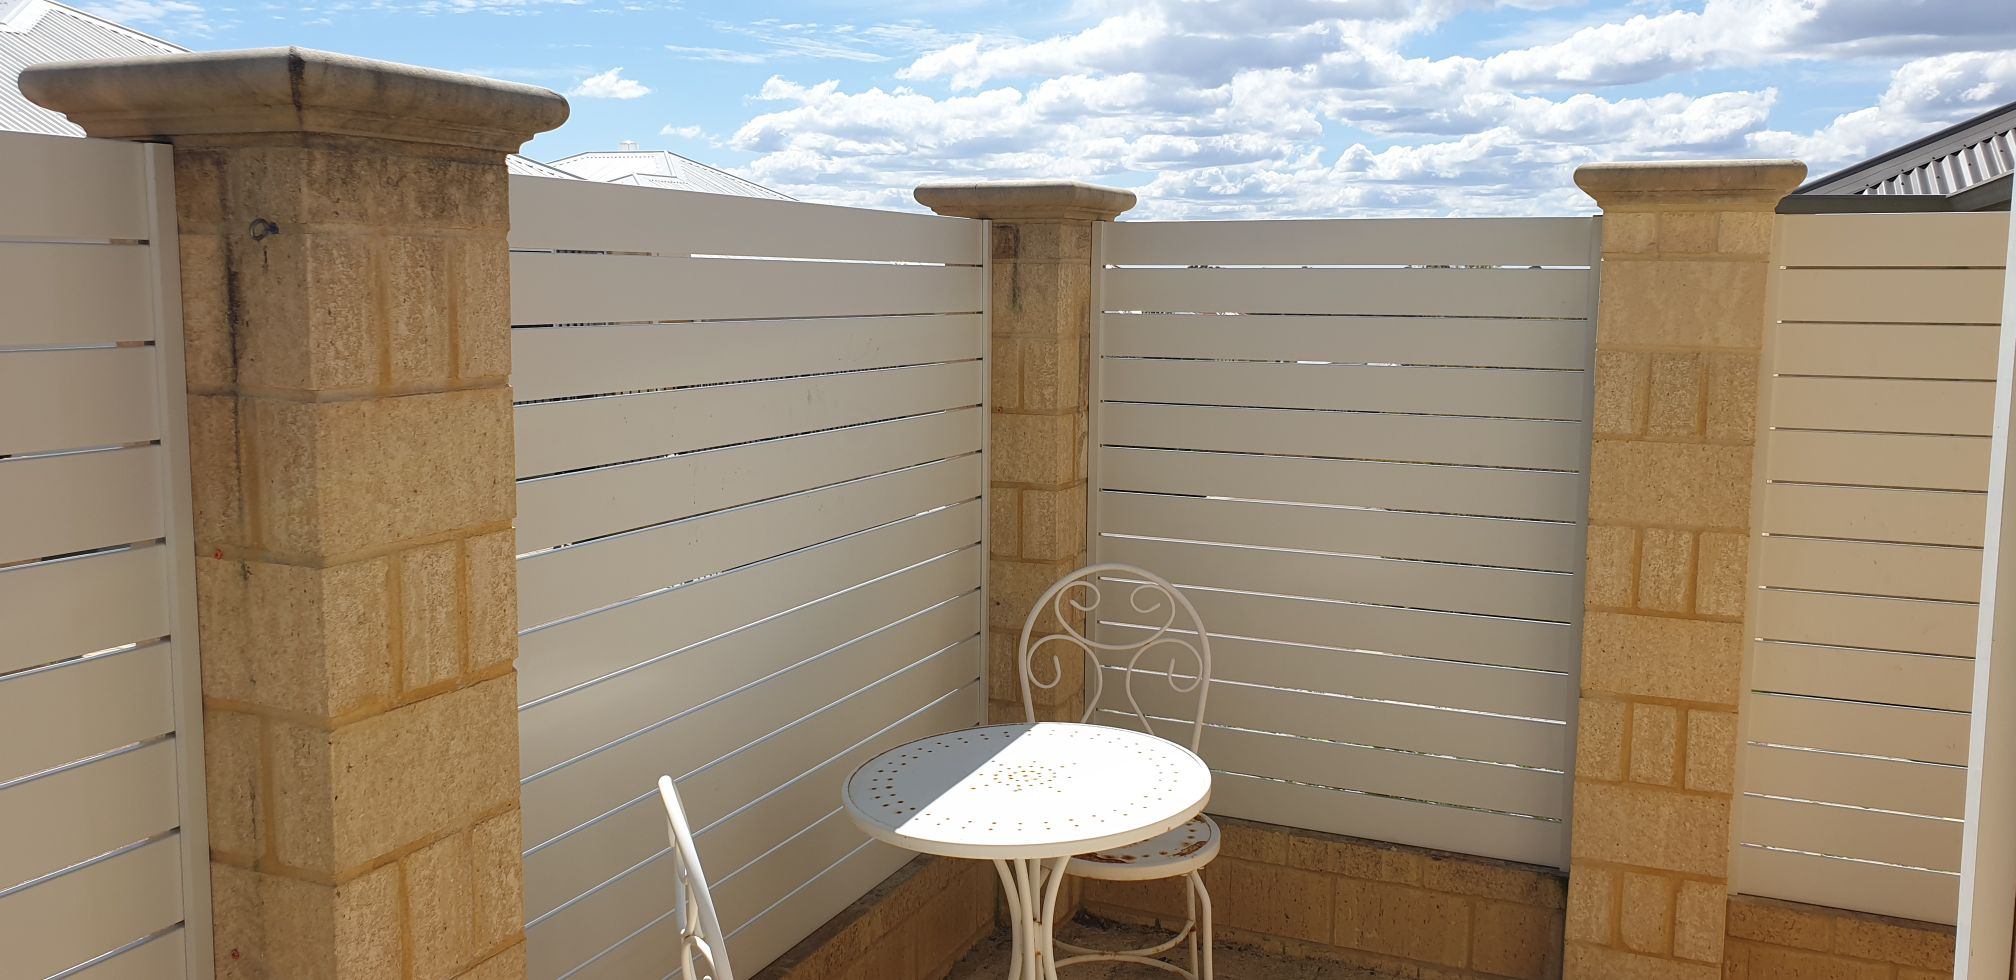 Slat Fencing - 100mm slats - fence - white